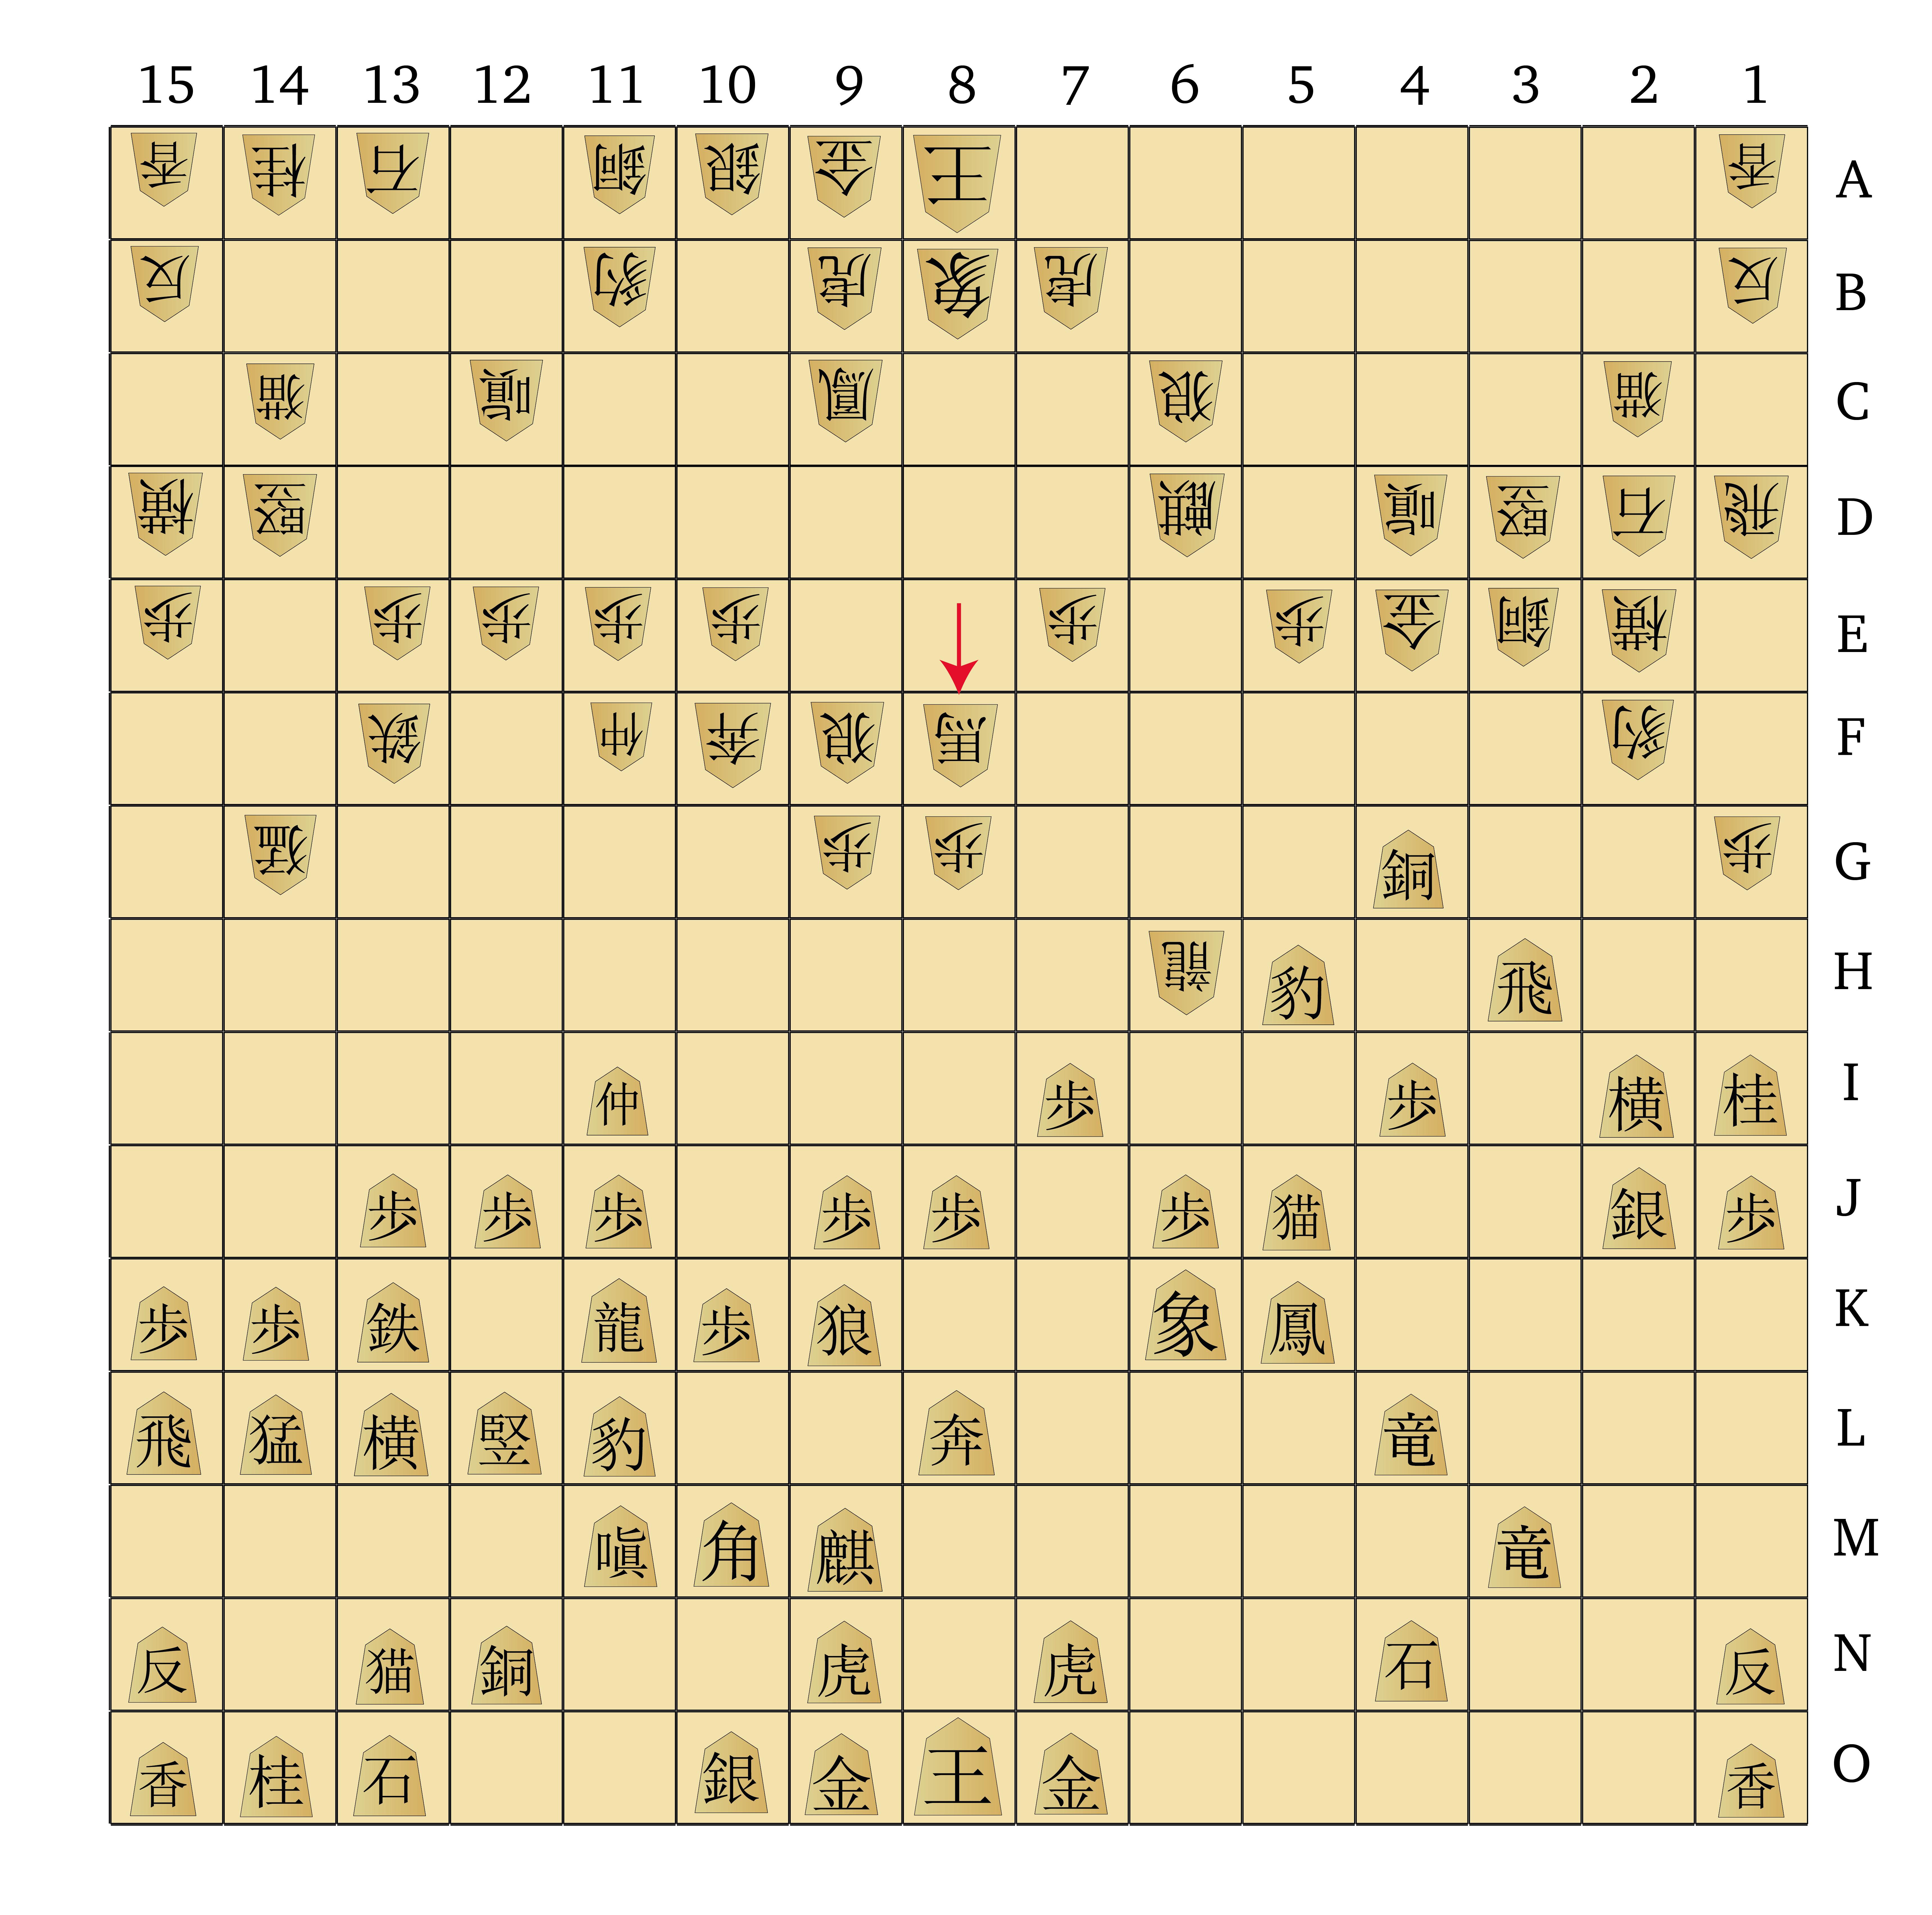 Dai Shogi 420 -- Move 230-01